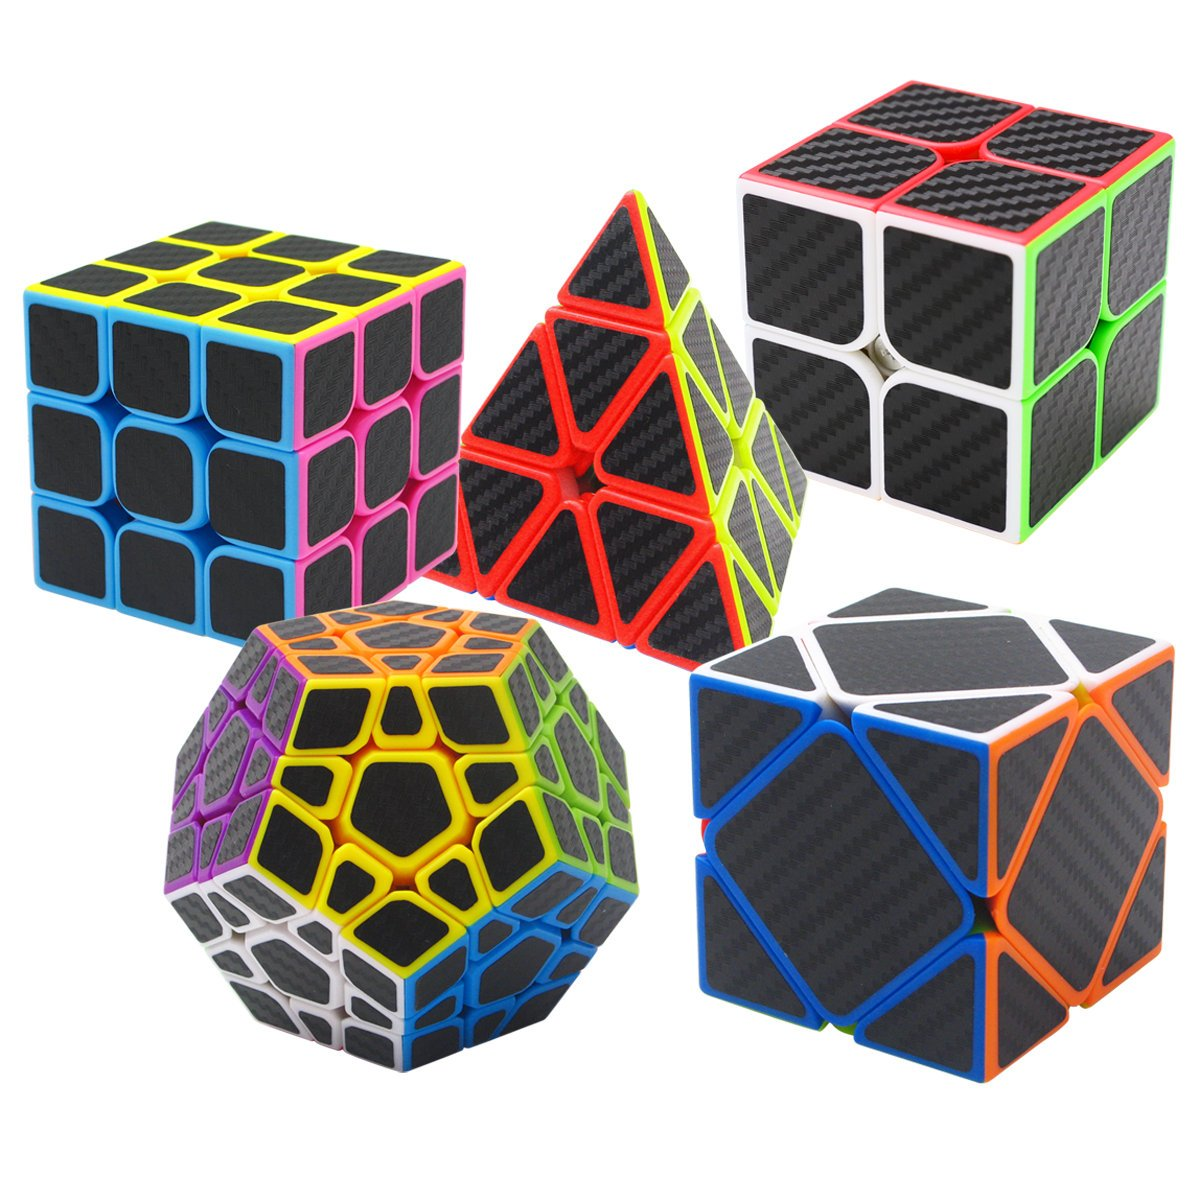 Coolzon Puzzle Cubes Megaminx + Pyraminx + 2x2x2 + 3x3x3 + Skewb 5 ...